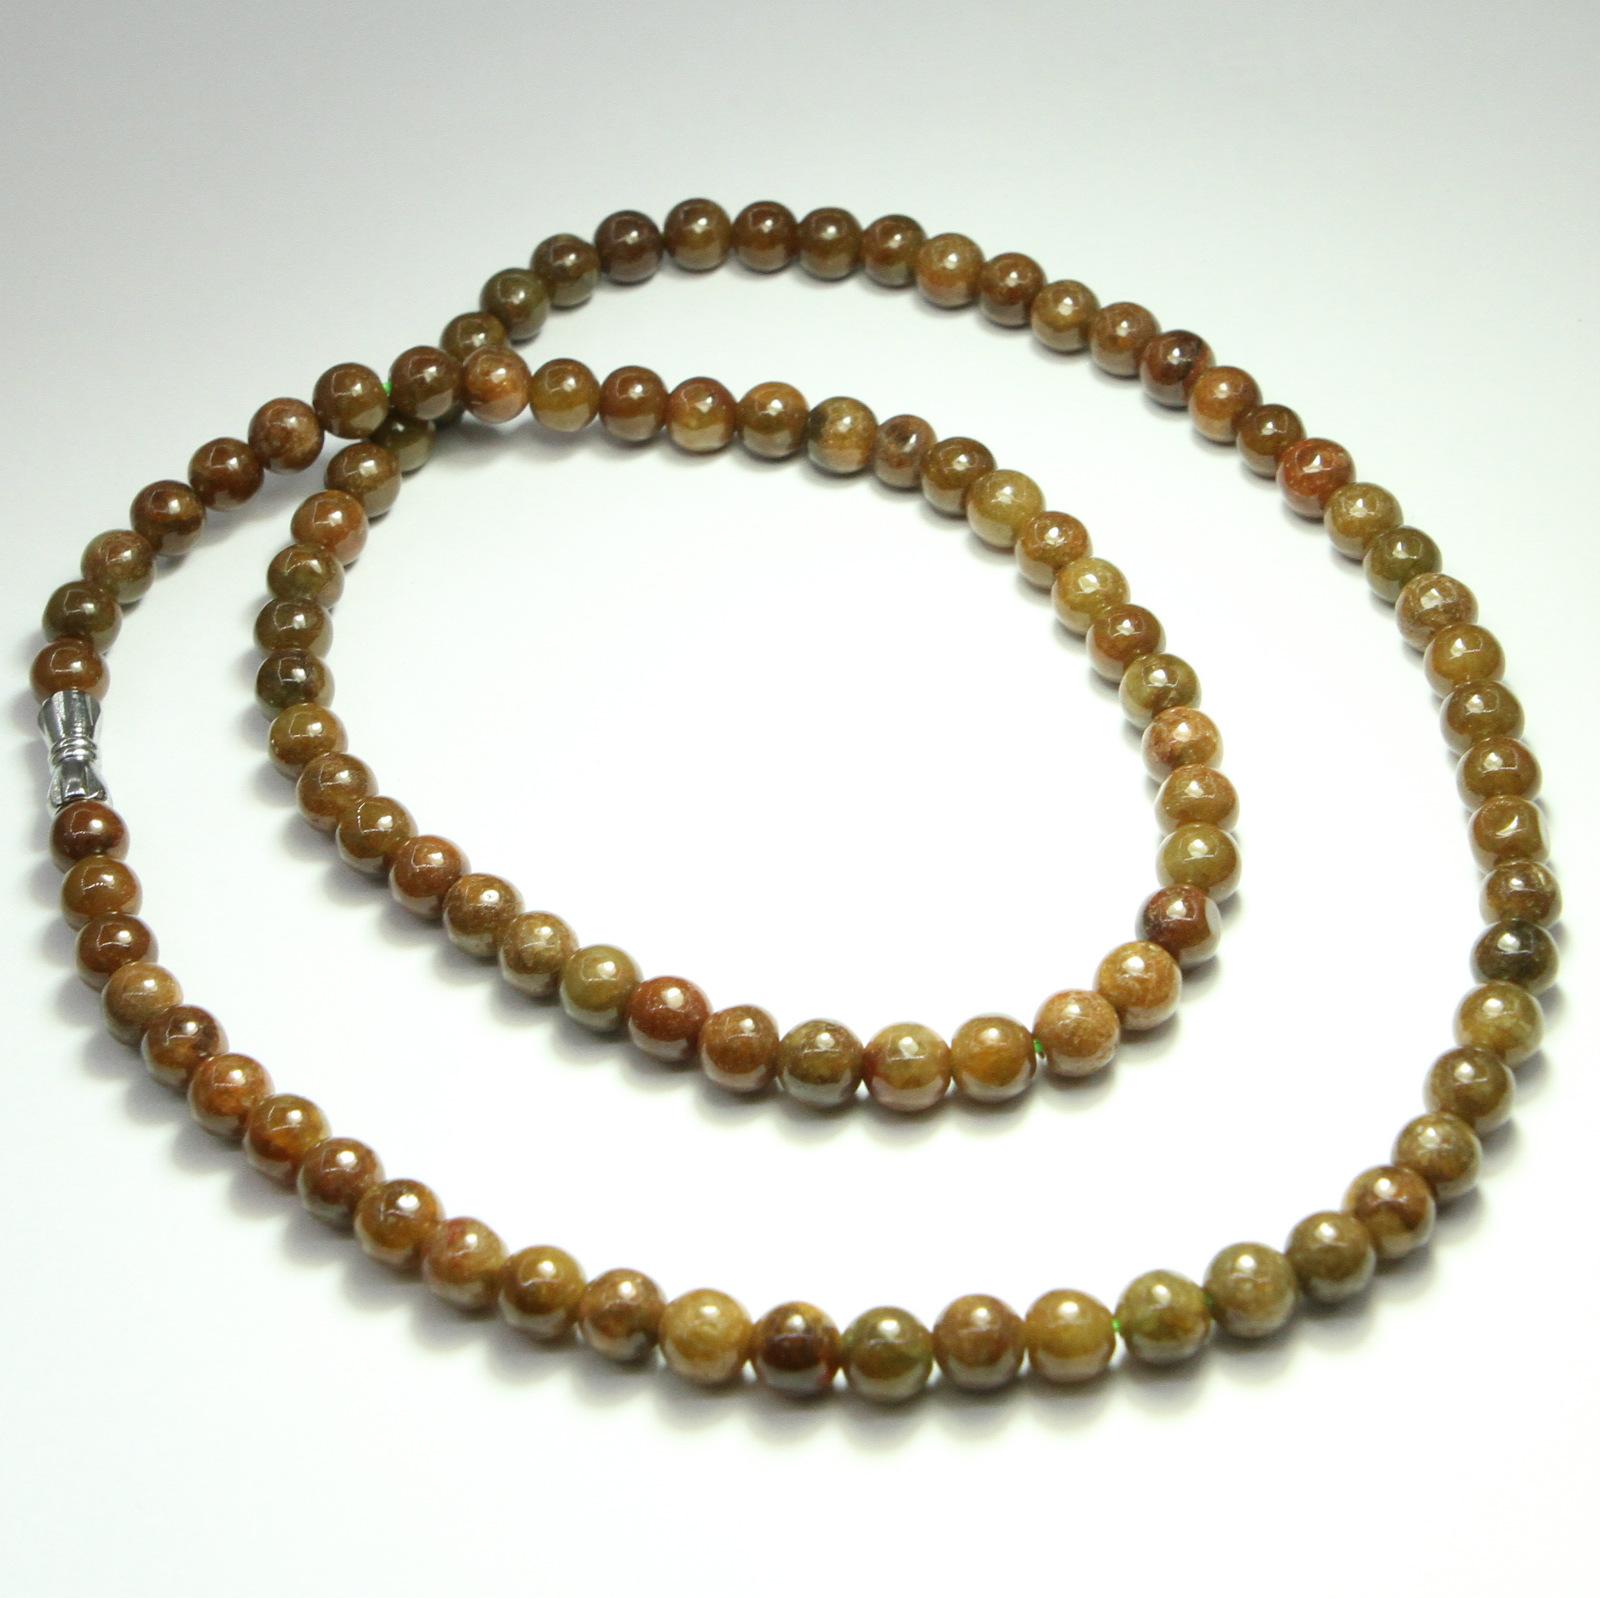 Genuine Jade Beads: 6mm Round Beads Brown Burmese Jadeite Jade 20 Inches